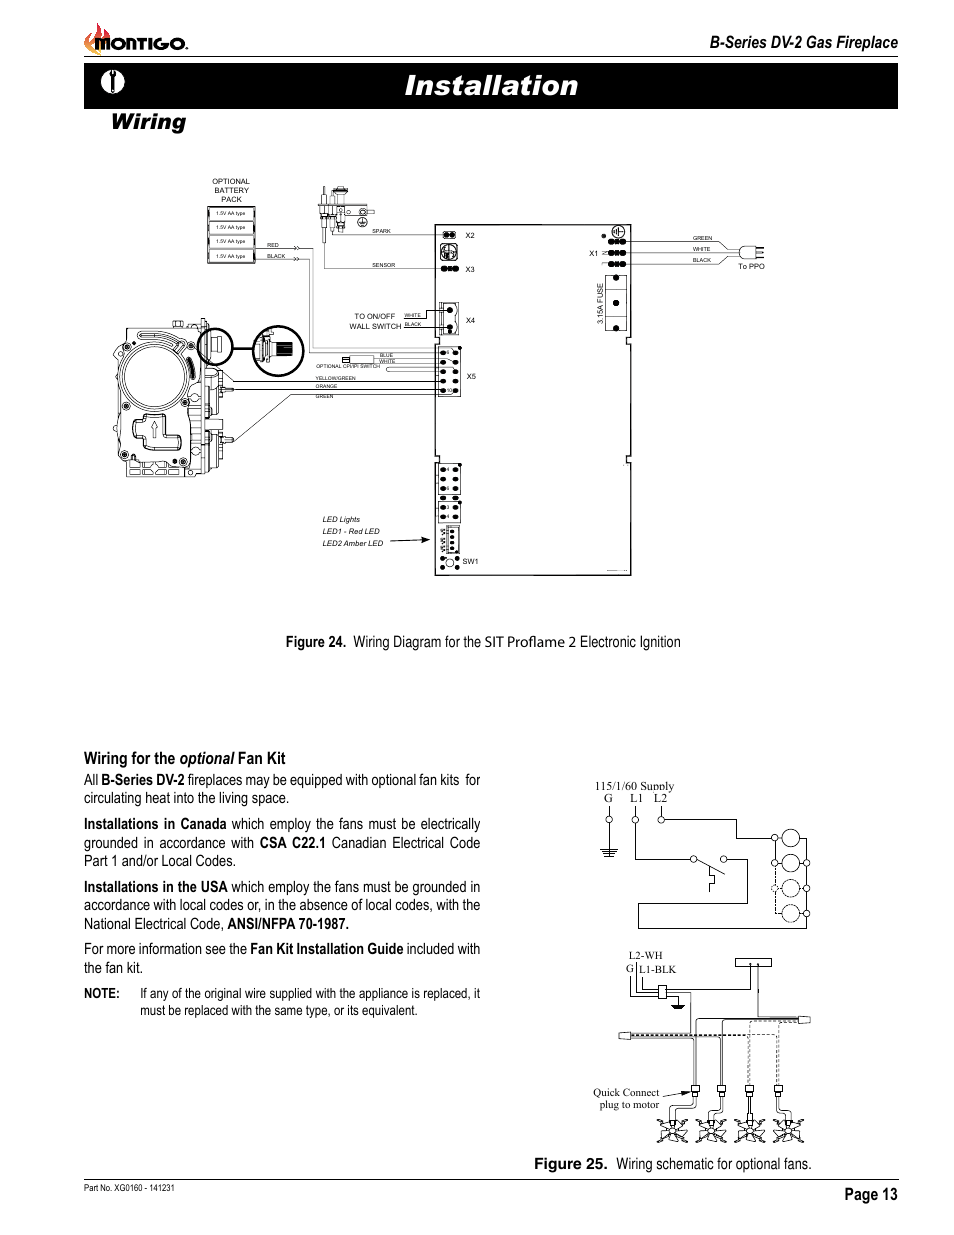 hight resolution of installation wiring page 13 b series dv 2 gas fireplace montigo b34dv user manual page 13 26